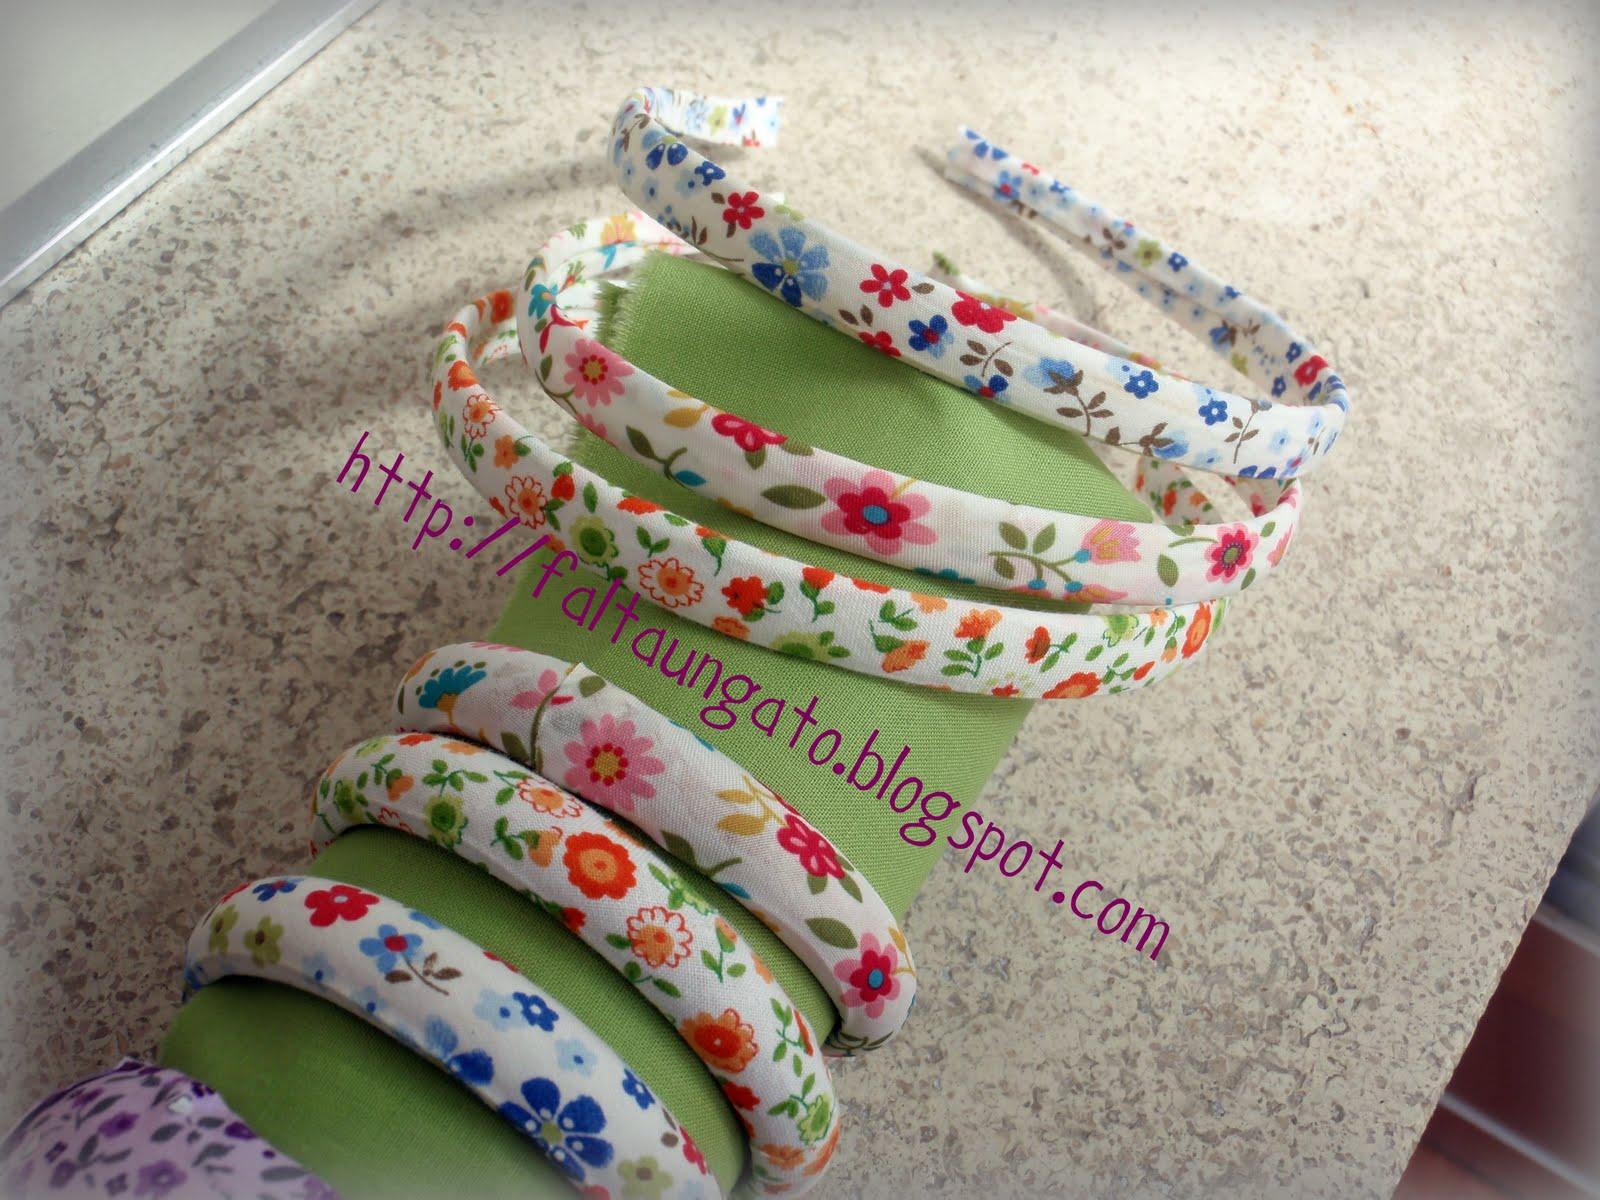 pulseras forradas con tela de algodn por dentro son de madera muy coloridas